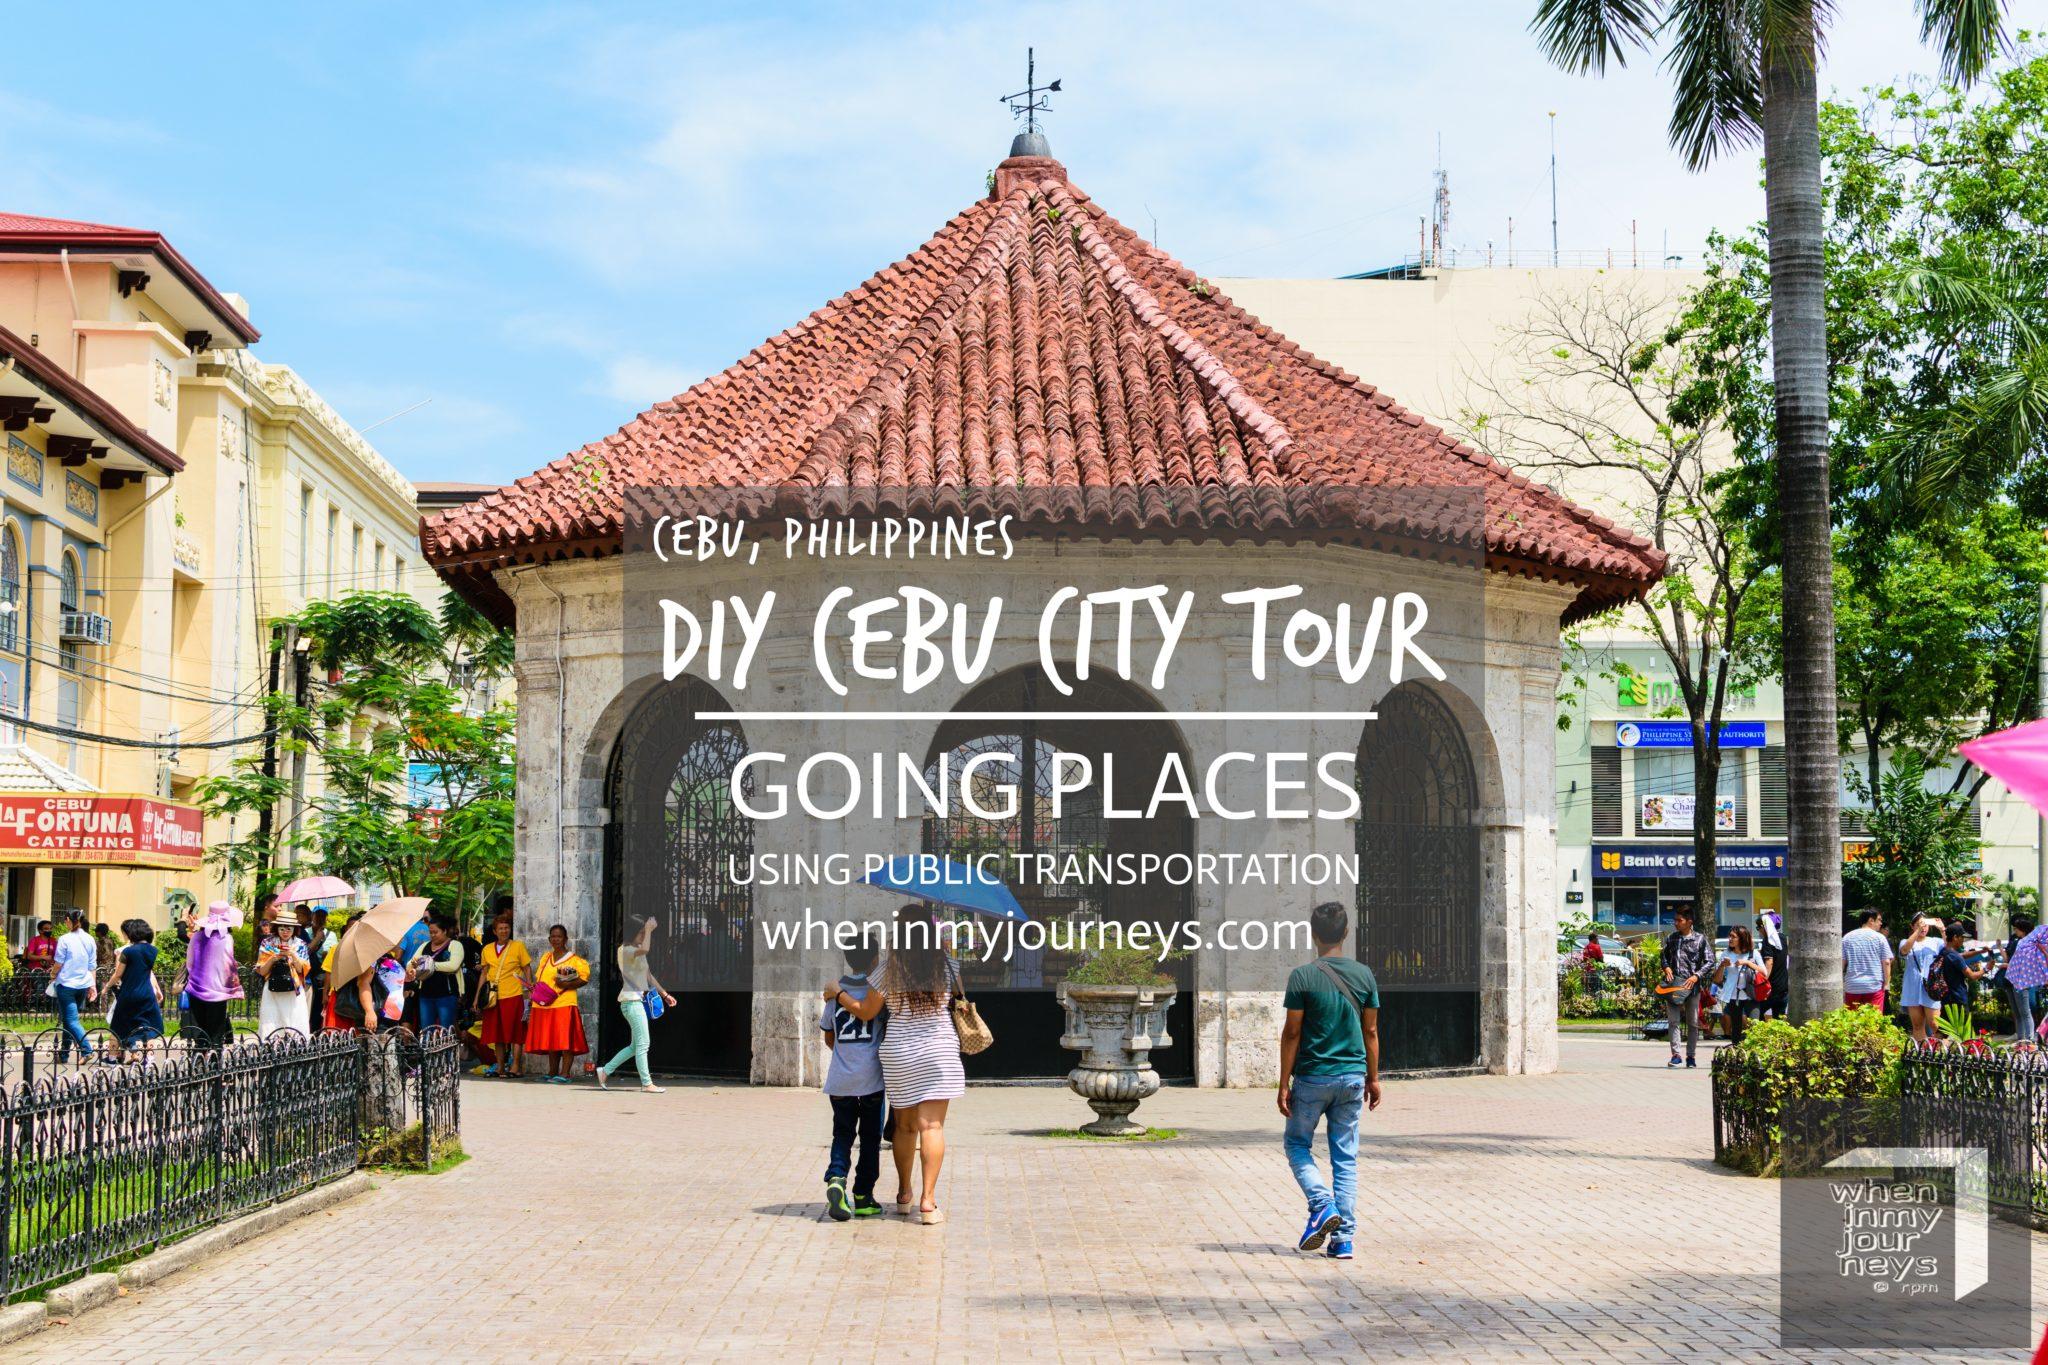 narrative report on cebu city tour Cebu tour - diy style - cebu island forum asia walking and biking trails are also popular in cebu city's highlands cebu tour - diy style.